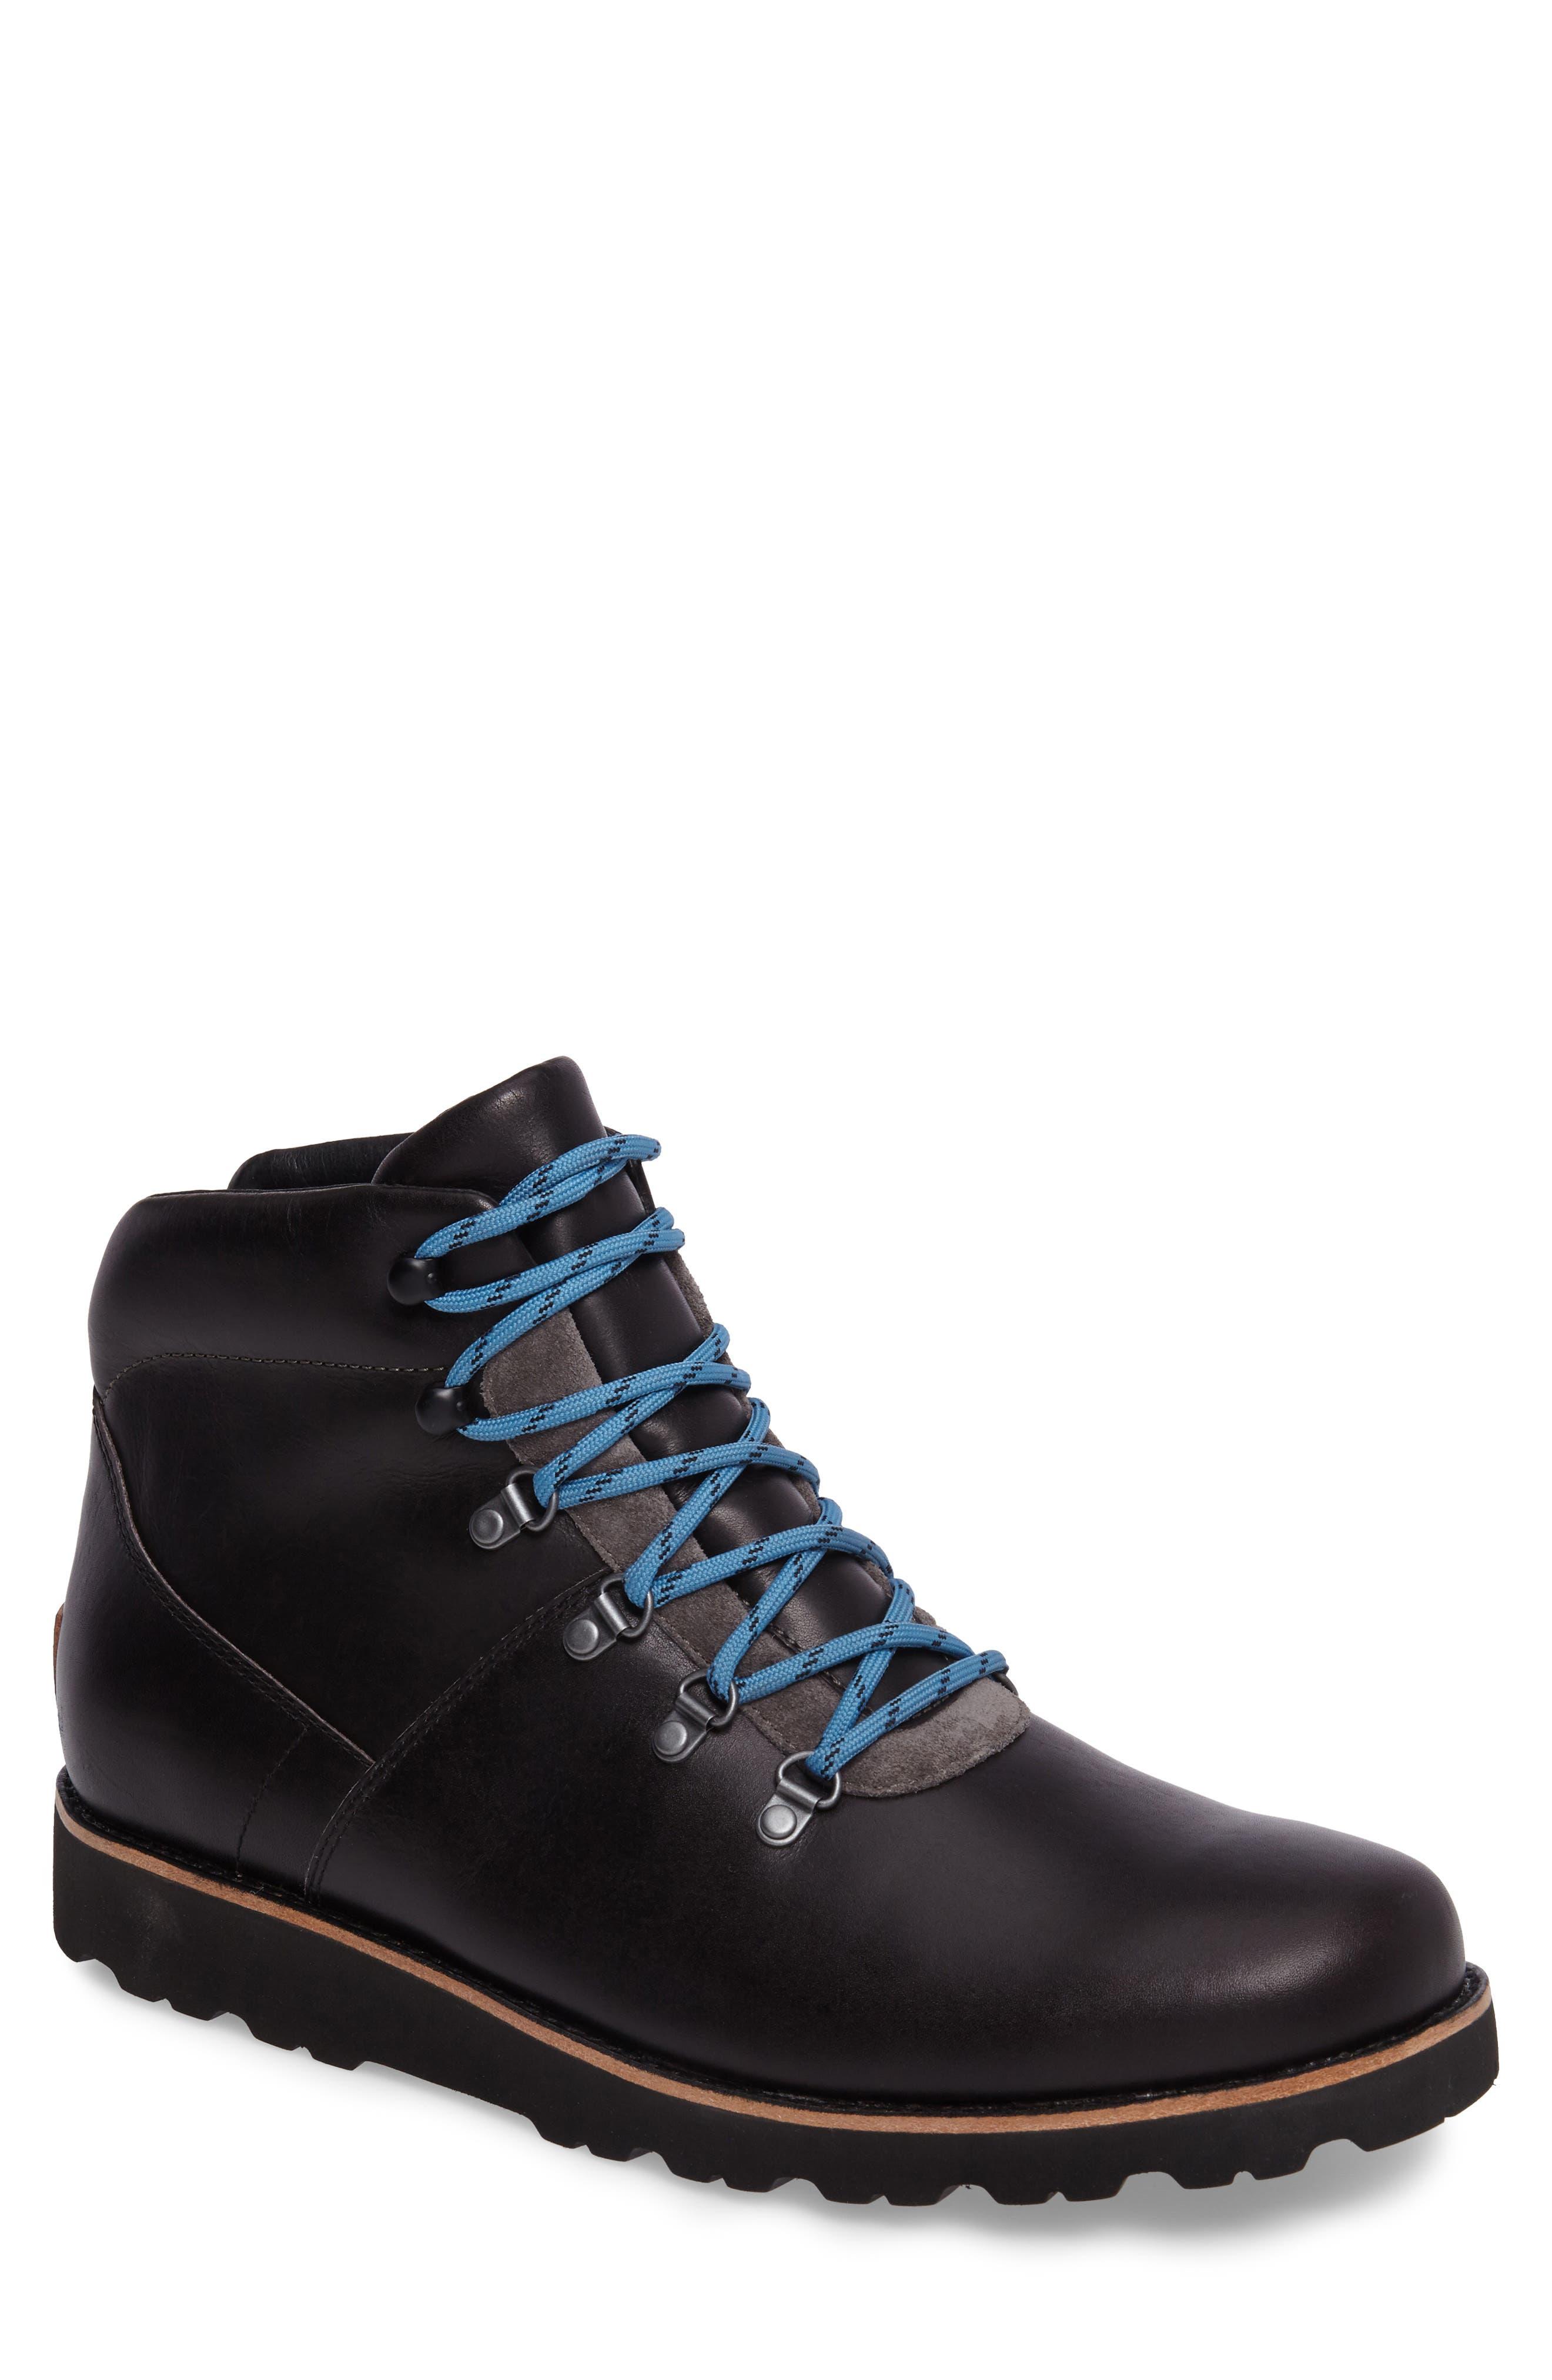 Halfstein Plain Toe Waterproof Boot,                             Main thumbnail 1, color,                             CHARCOAL